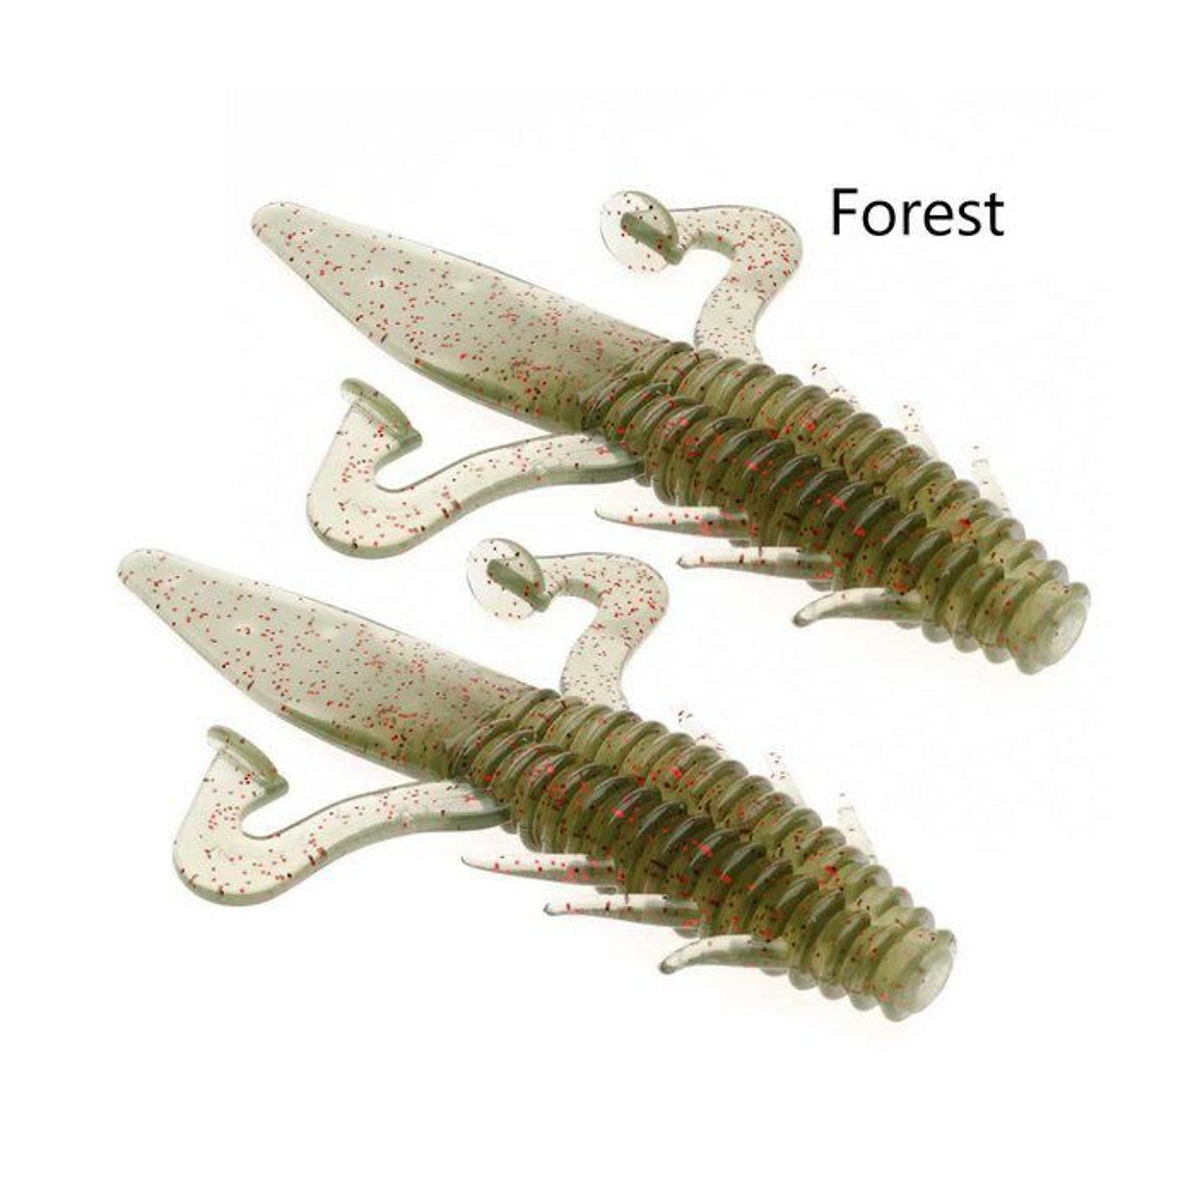 Isca Artificial Soft Cucaracha Animal Fishing By Johnny Hoffmann - 2un  - Pesca Adventure